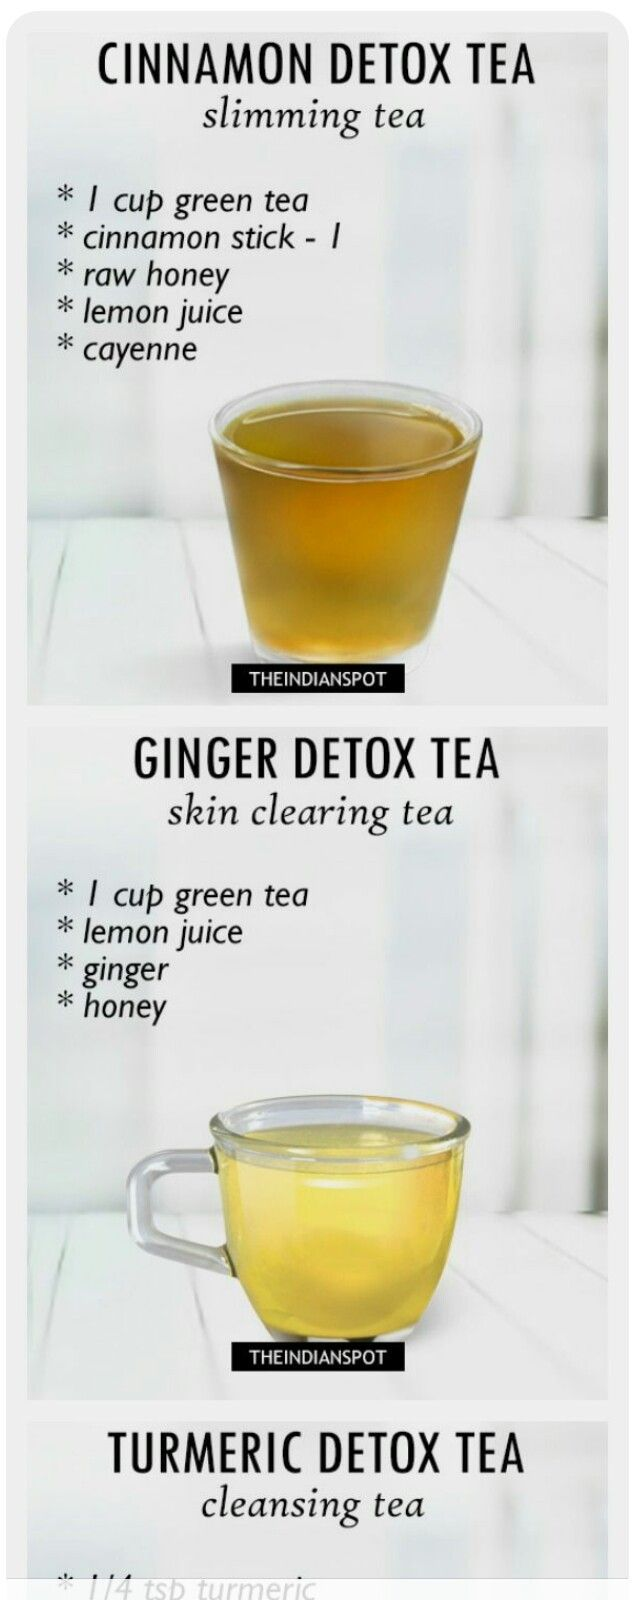 Detox Tea & Skin Clearing Tea #detoxteaweightloss